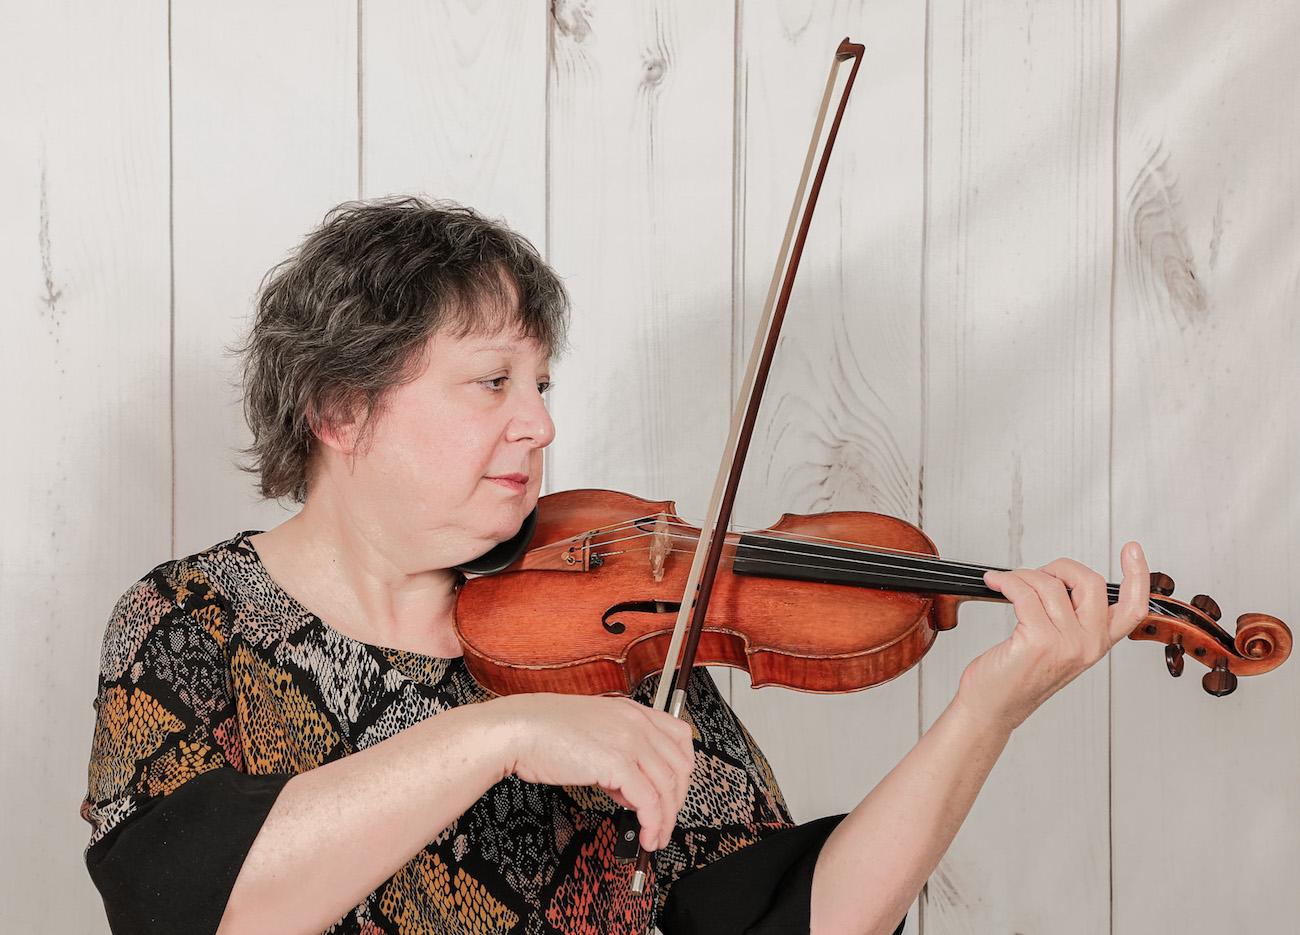 Angela cavadas playing violin